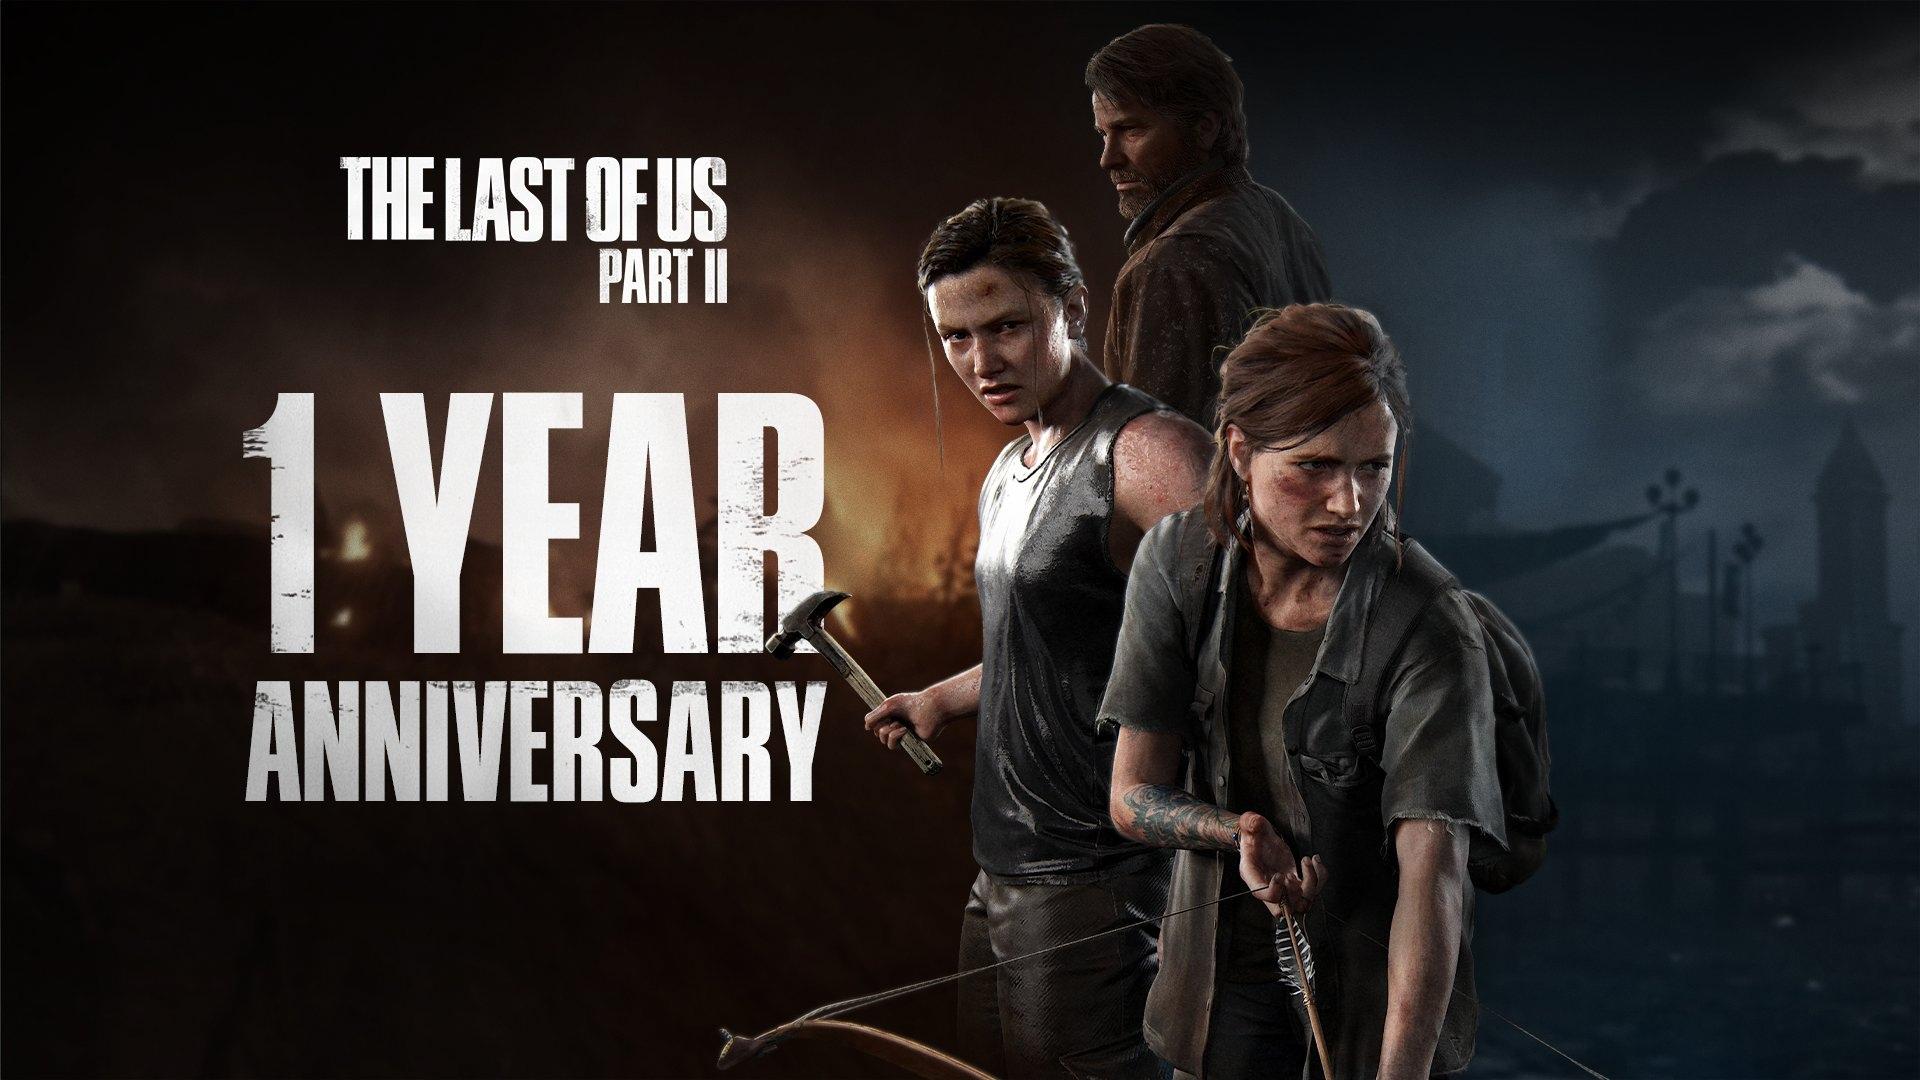 Сегодня исполнилось год с релиза The Last of Us Part 2